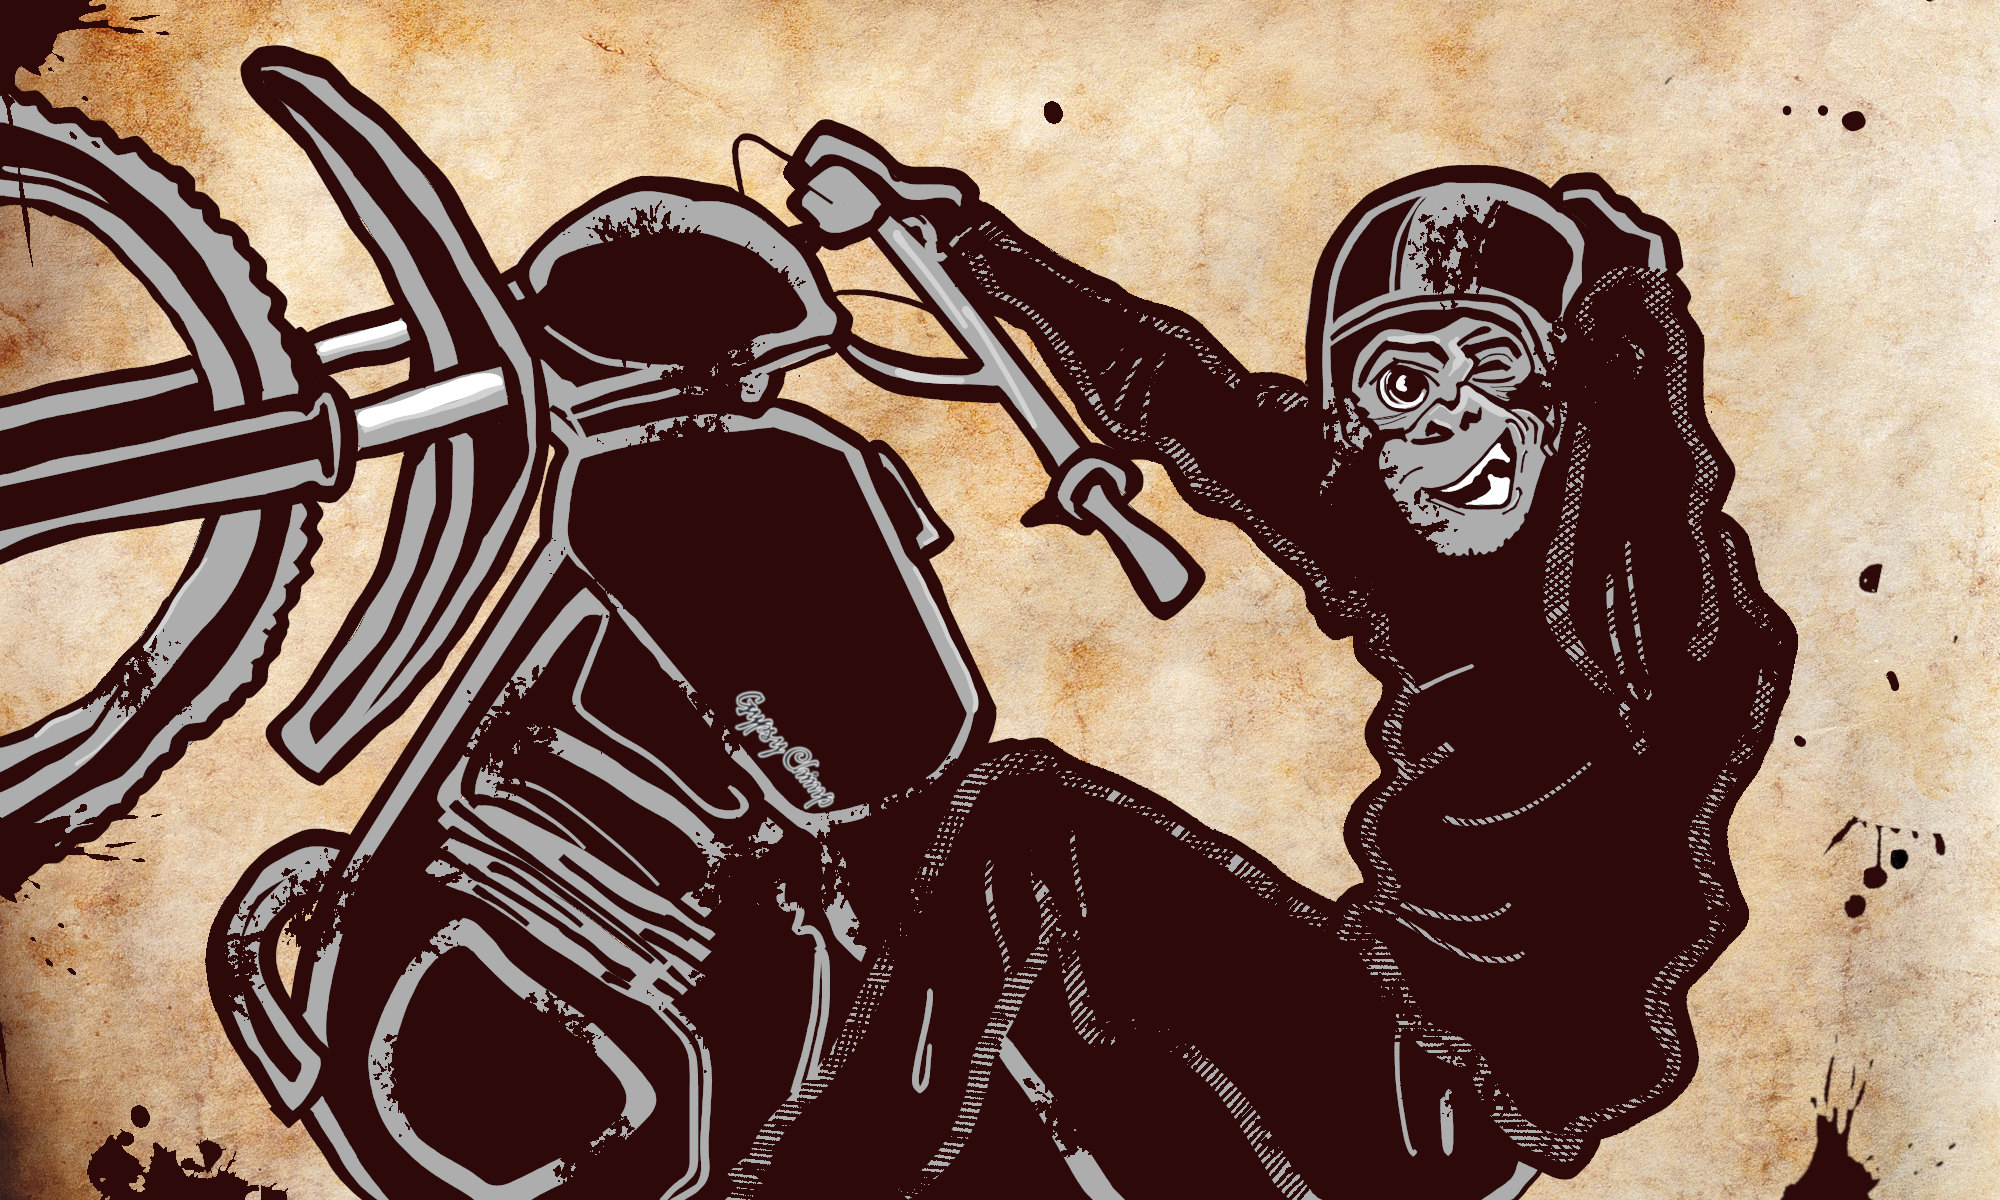 Gypsy Chimps Motorradblog